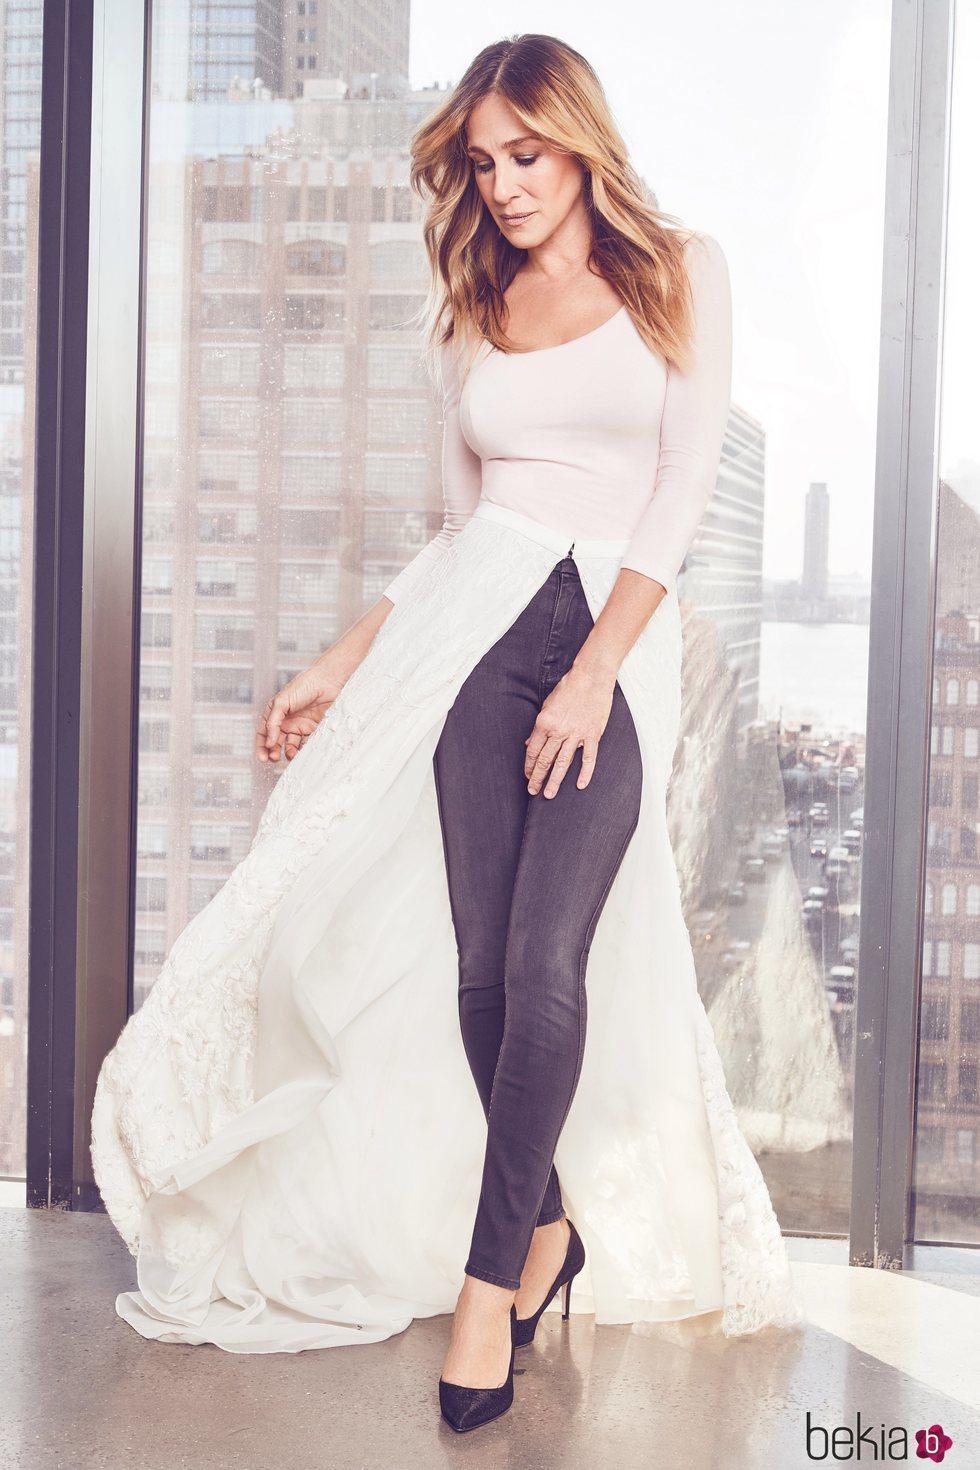 Foto : El vestido de novia de Sarah Jessica Parker en Sexo